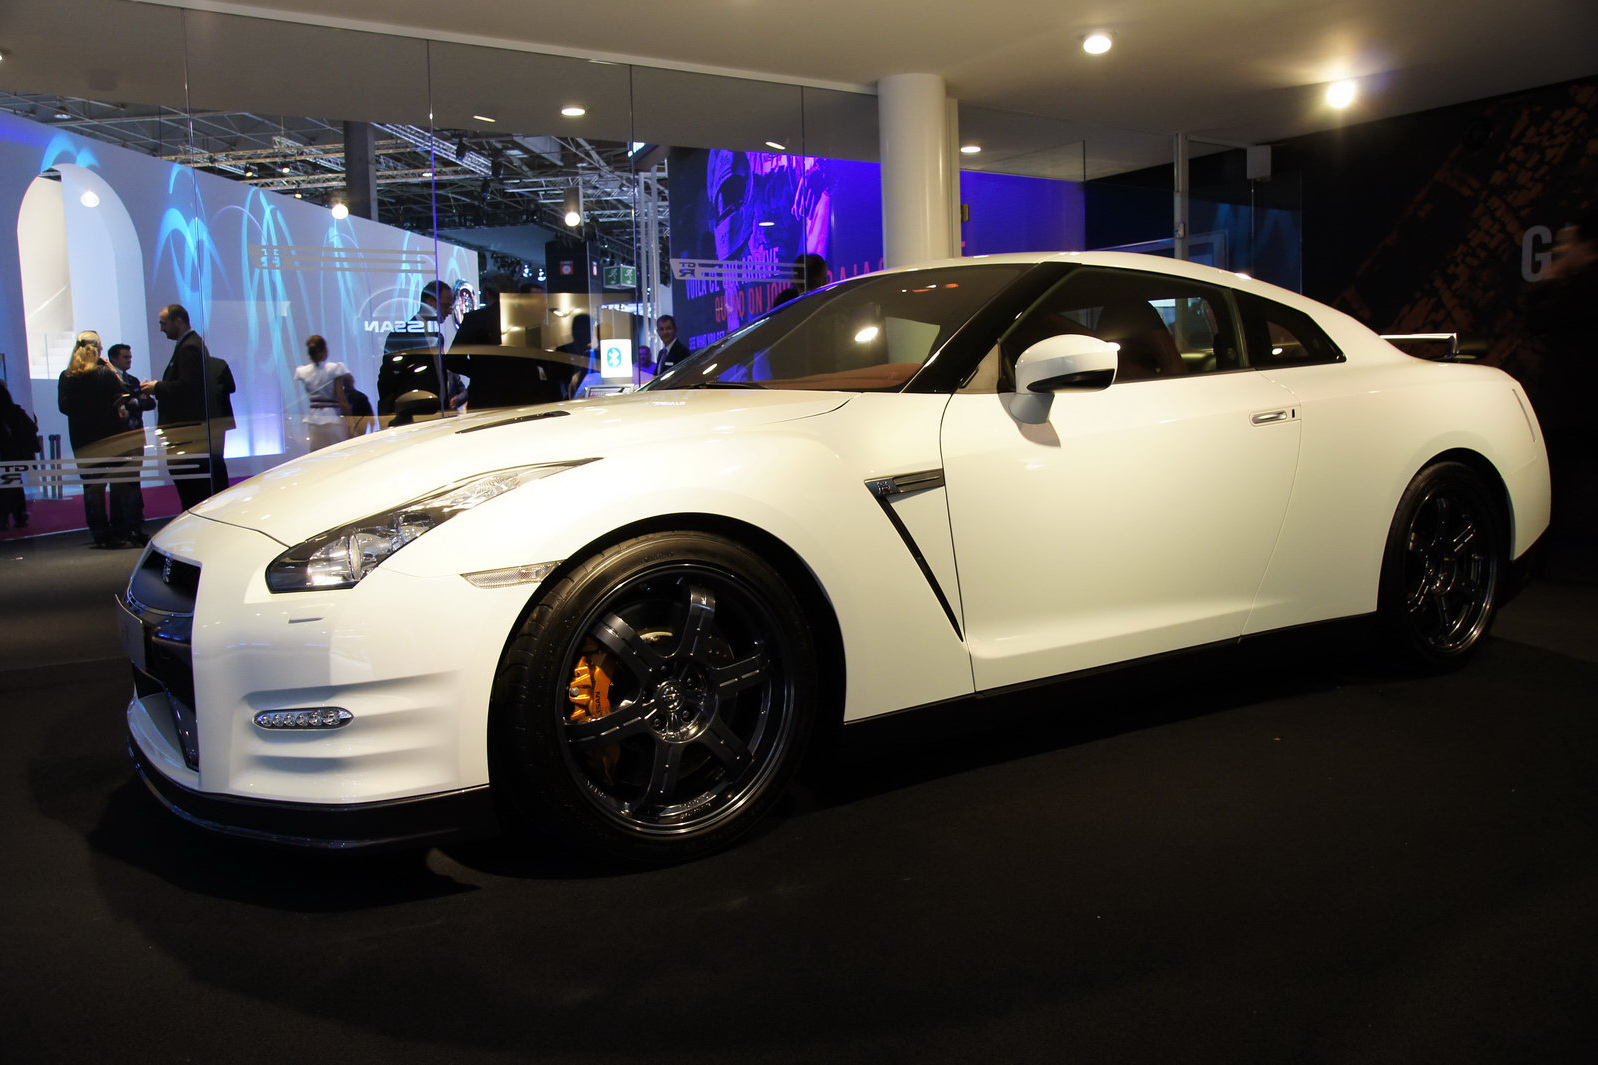 Wallpapers Cars: 2012 Nissan gtr